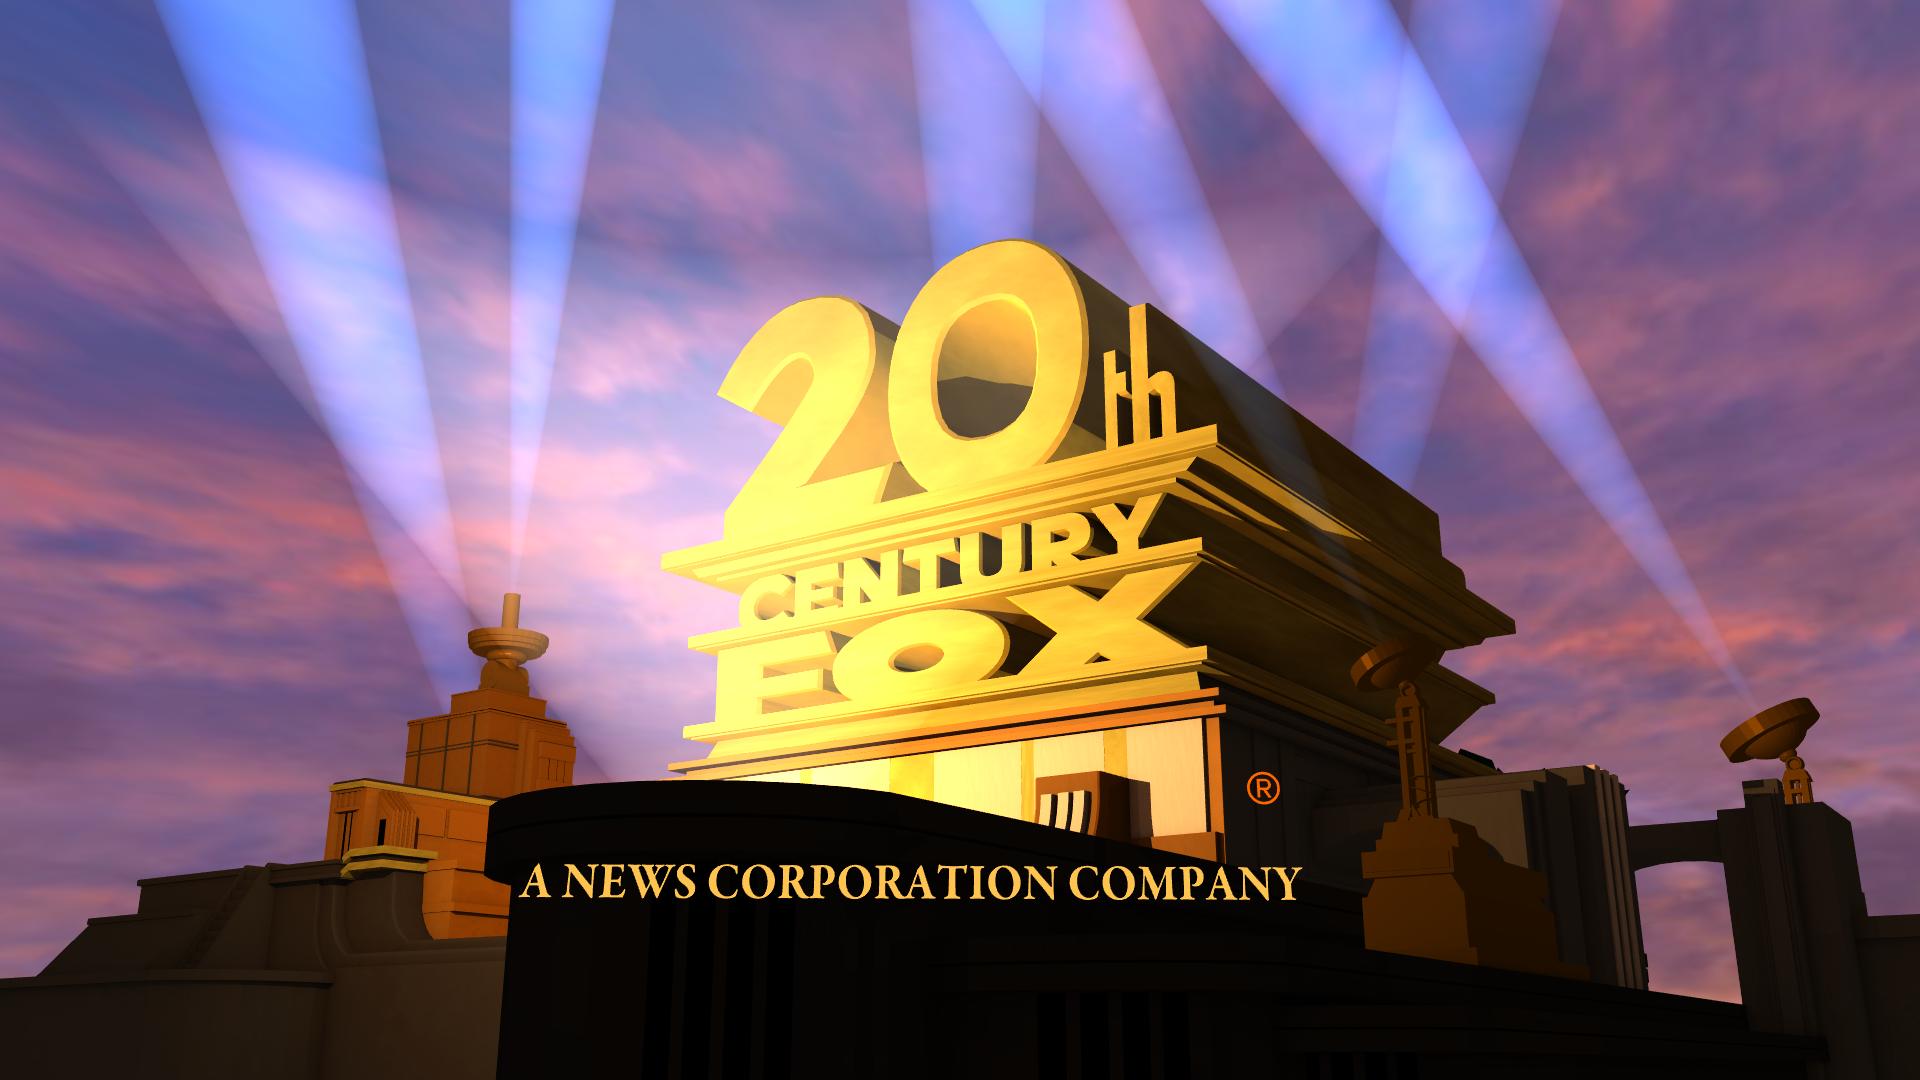 20th century fox 2009 blender download